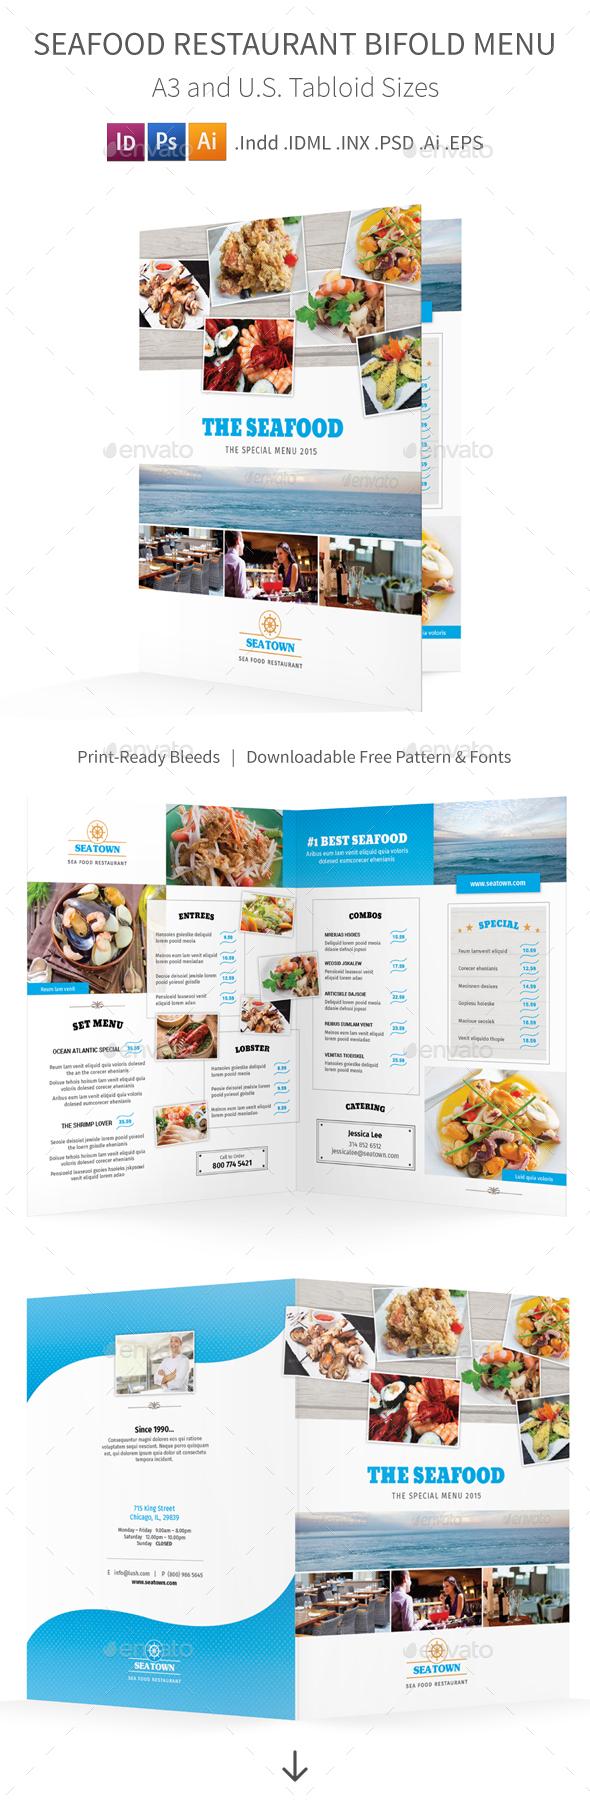 Seafood Restaurant Bifold Halffold Menu